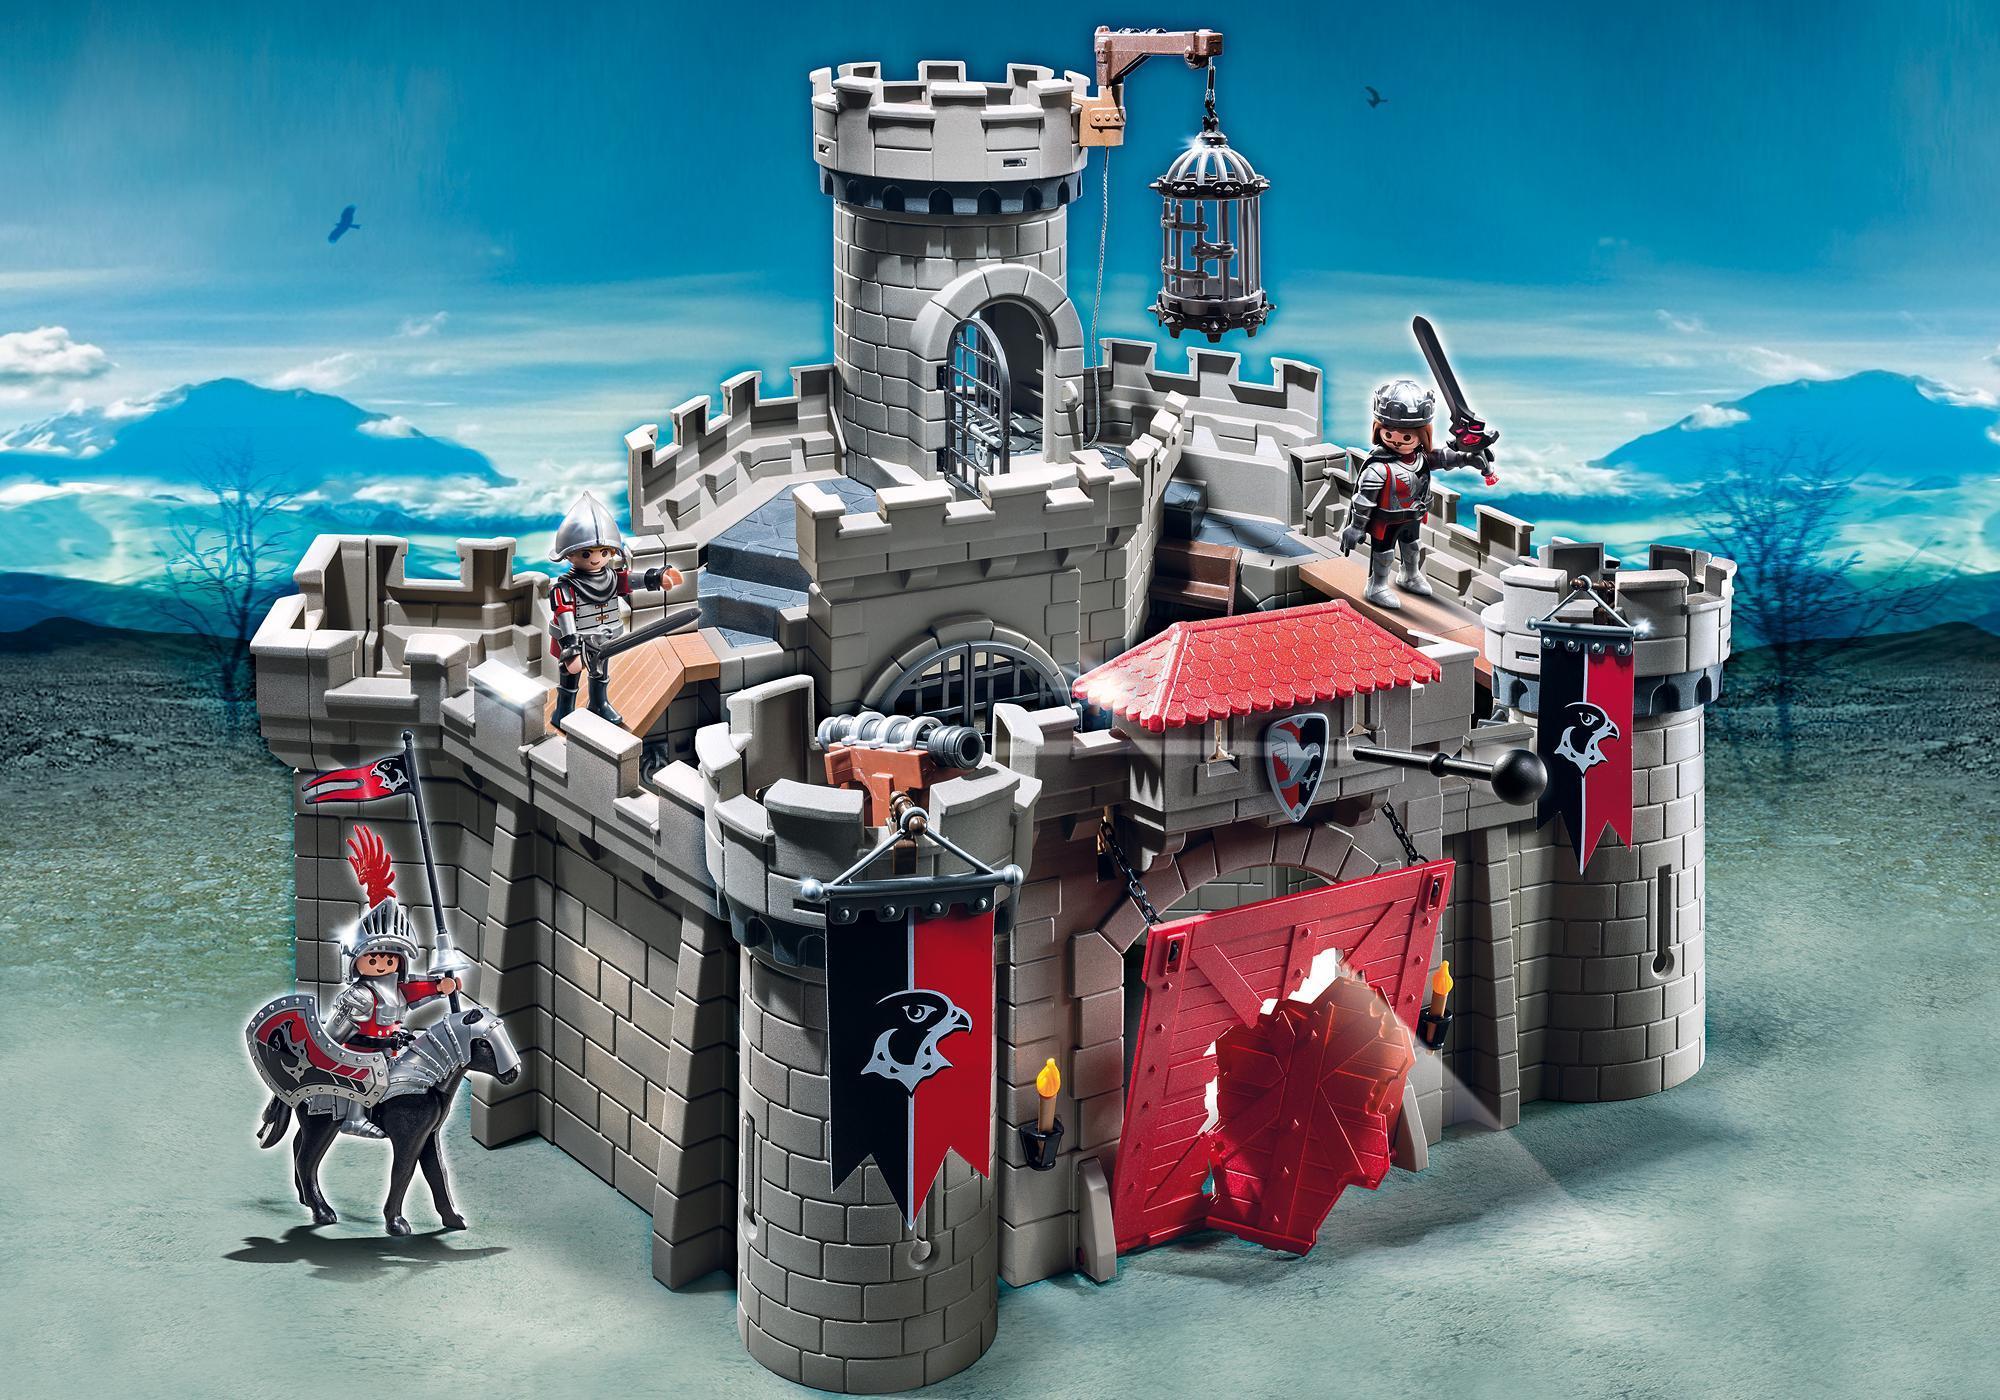 http://media.playmobil.com/i/playmobil/6001_product_detail/Рыцари: Замок Рыцарей Ястреба